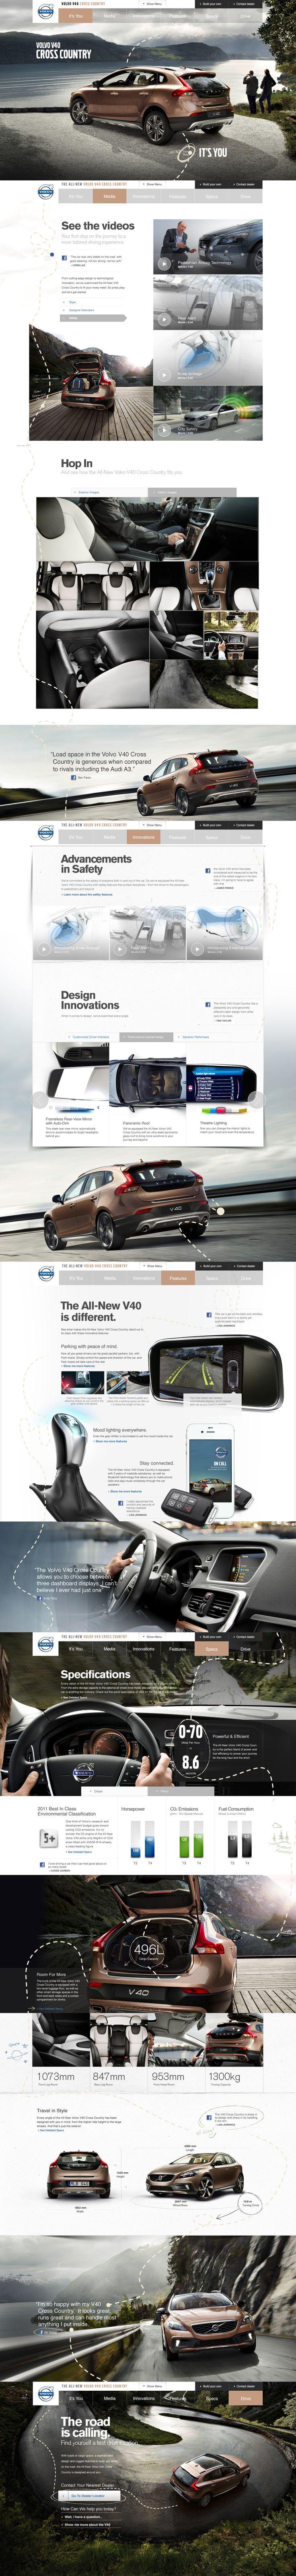 Cool Automotive Web Design on the Internet. Volvo. #automotive #webdesign #webdevelopment #website